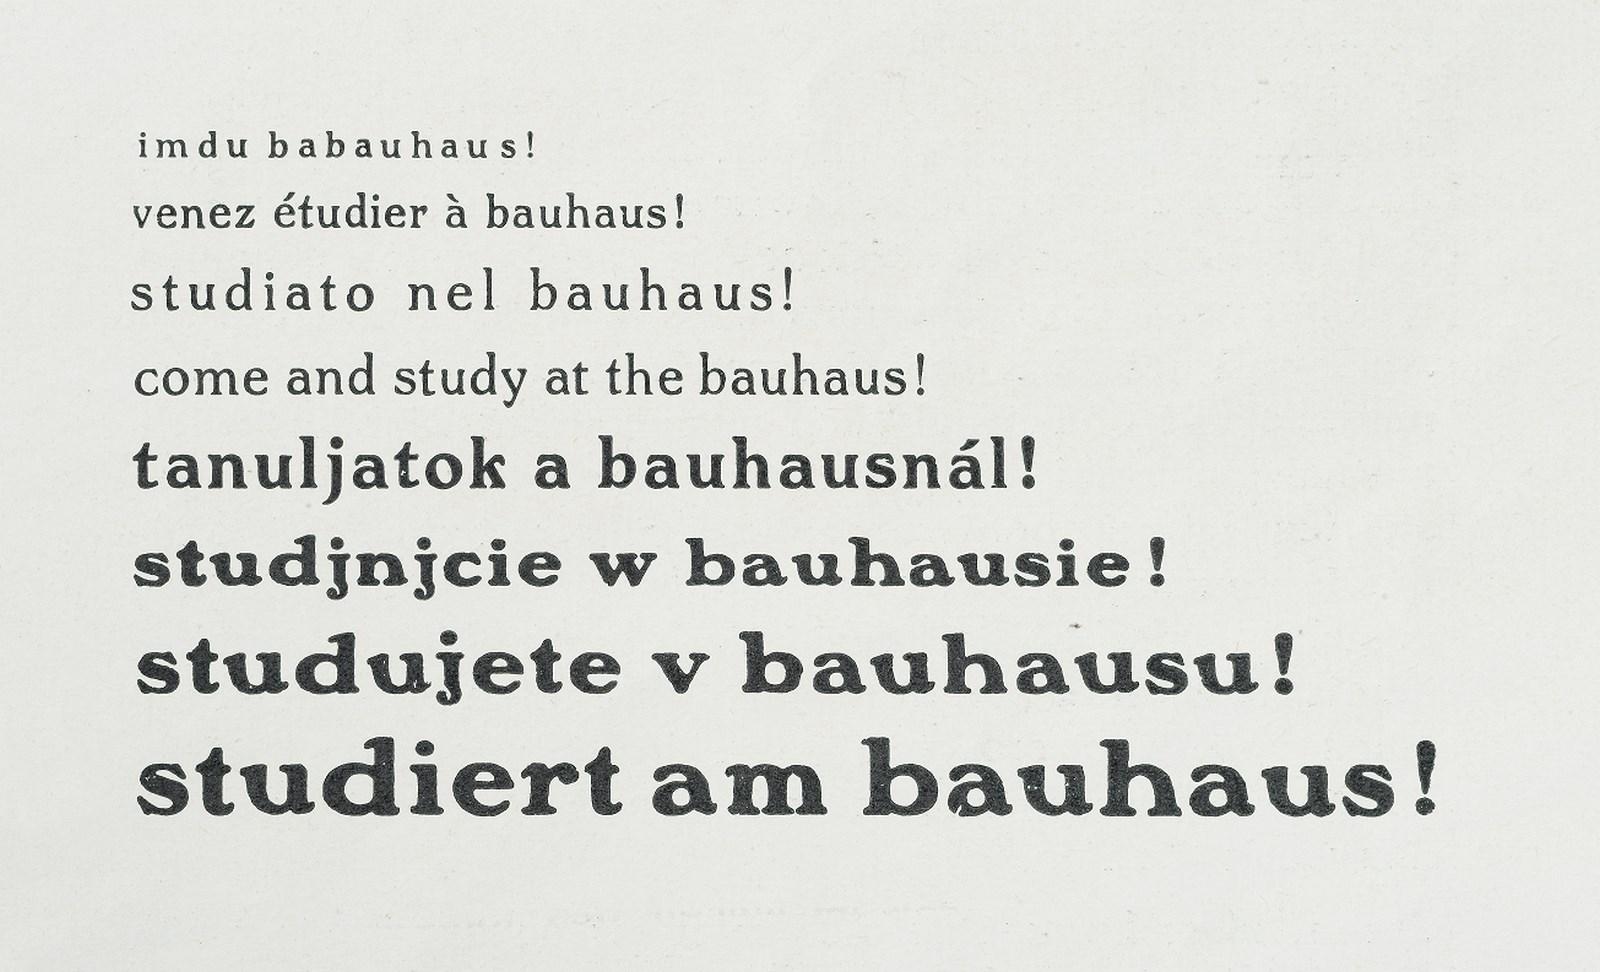 "annes Meyer (editor de la revista de diseño Bauhaus 2/3), ""¡estudien en la bauhaus! / study at the bauhaus!"", 1928  Foto: A. Körner (bildhübsche Fotografie) / Gentileza ifa"